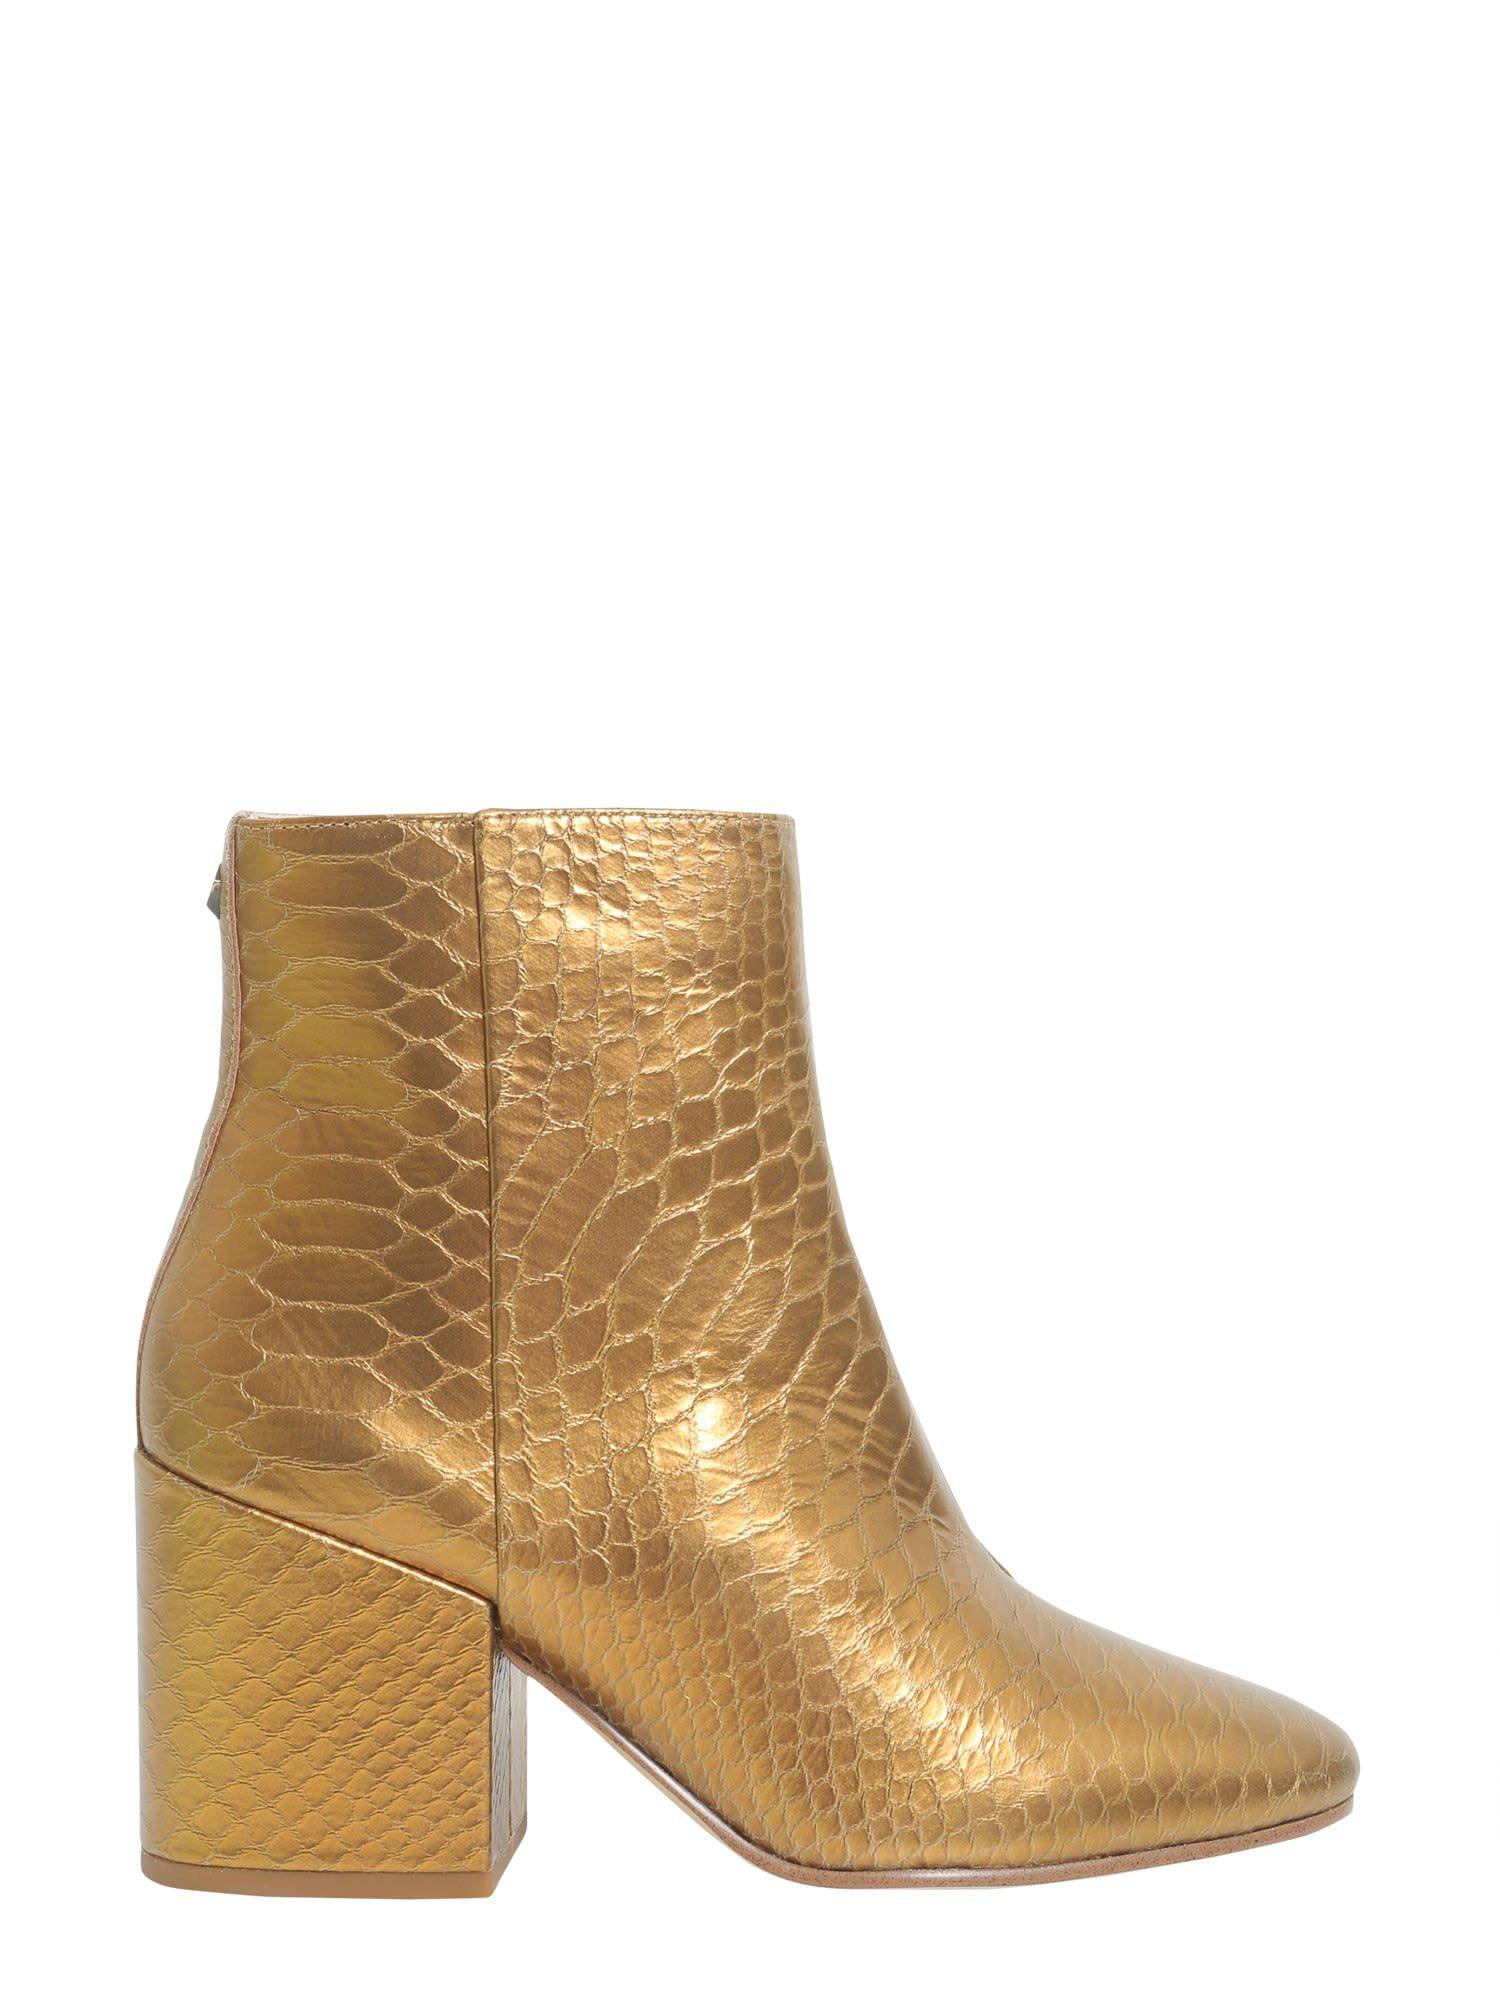 Sam Edelman Snake Printed Ankle Boots